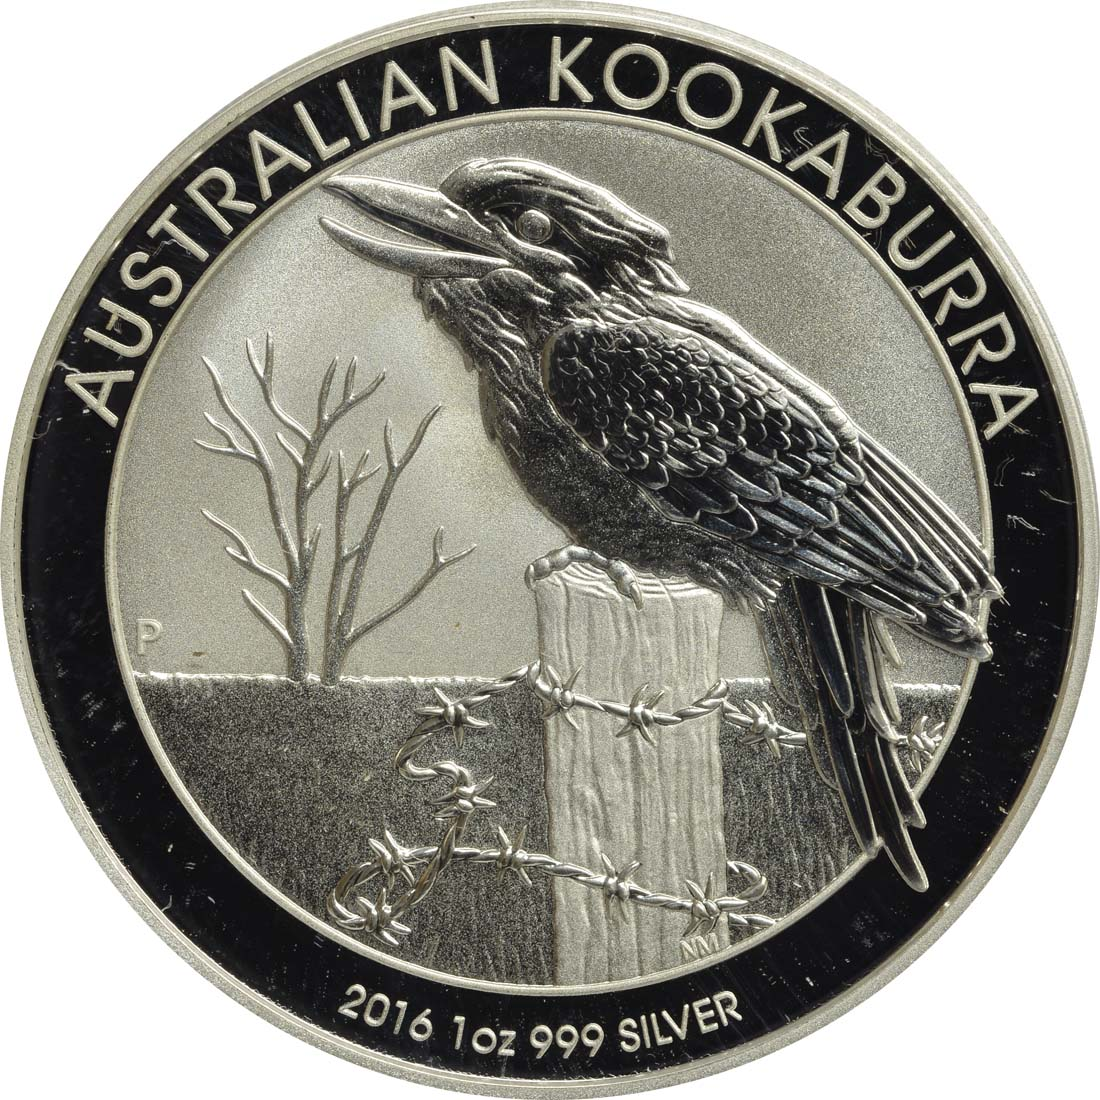 australien 1 dollar kookaburra 2016 silber stgl euro. Black Bedroom Furniture Sets. Home Design Ideas